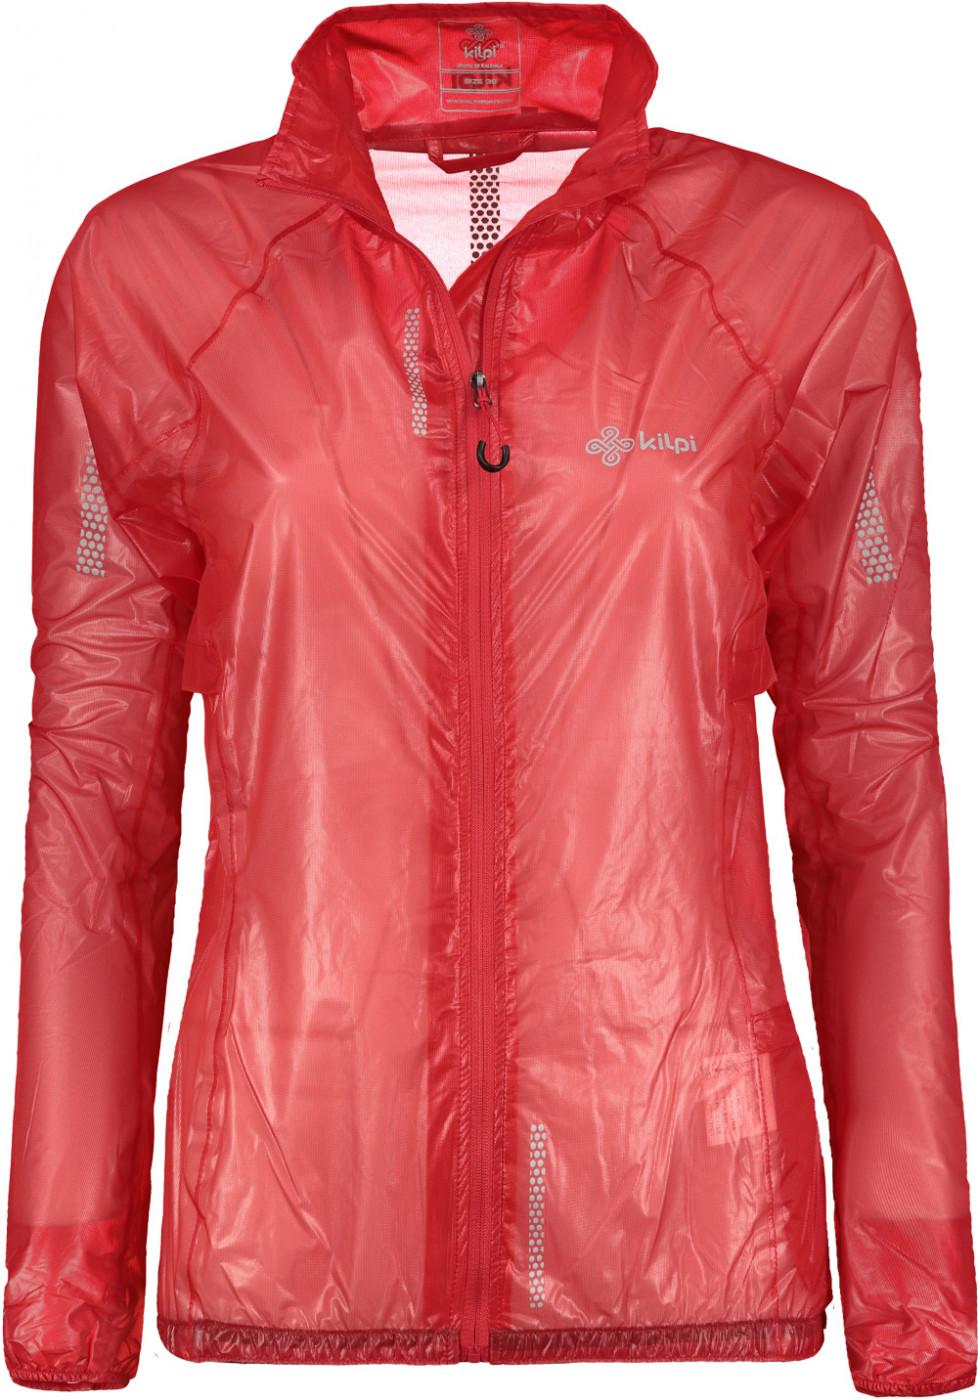 Women's jacket  KILPI JACKET ALL RAINAR-W